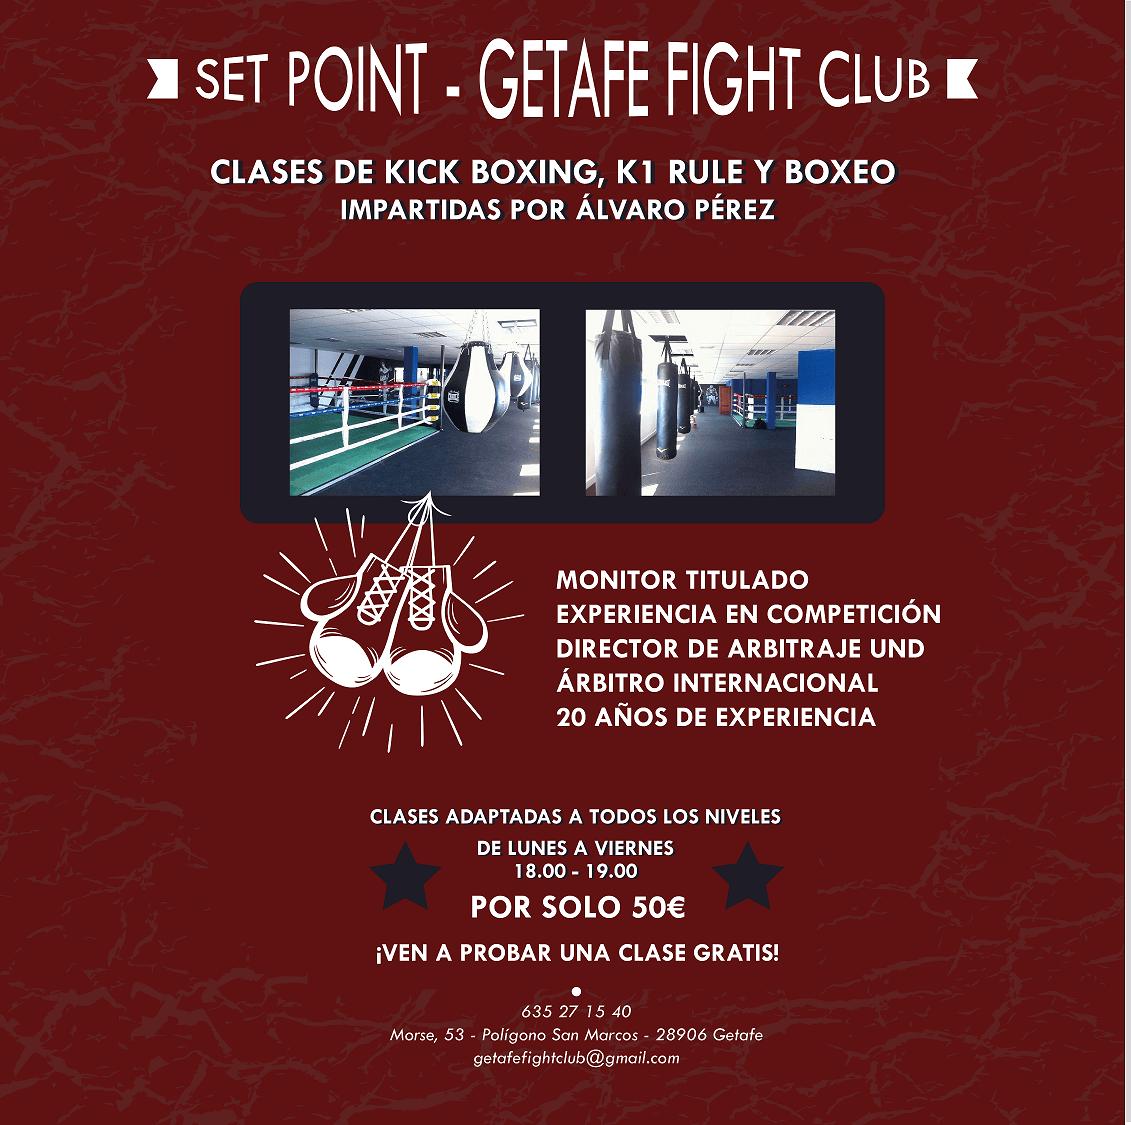 Clases Getafe Fight Club